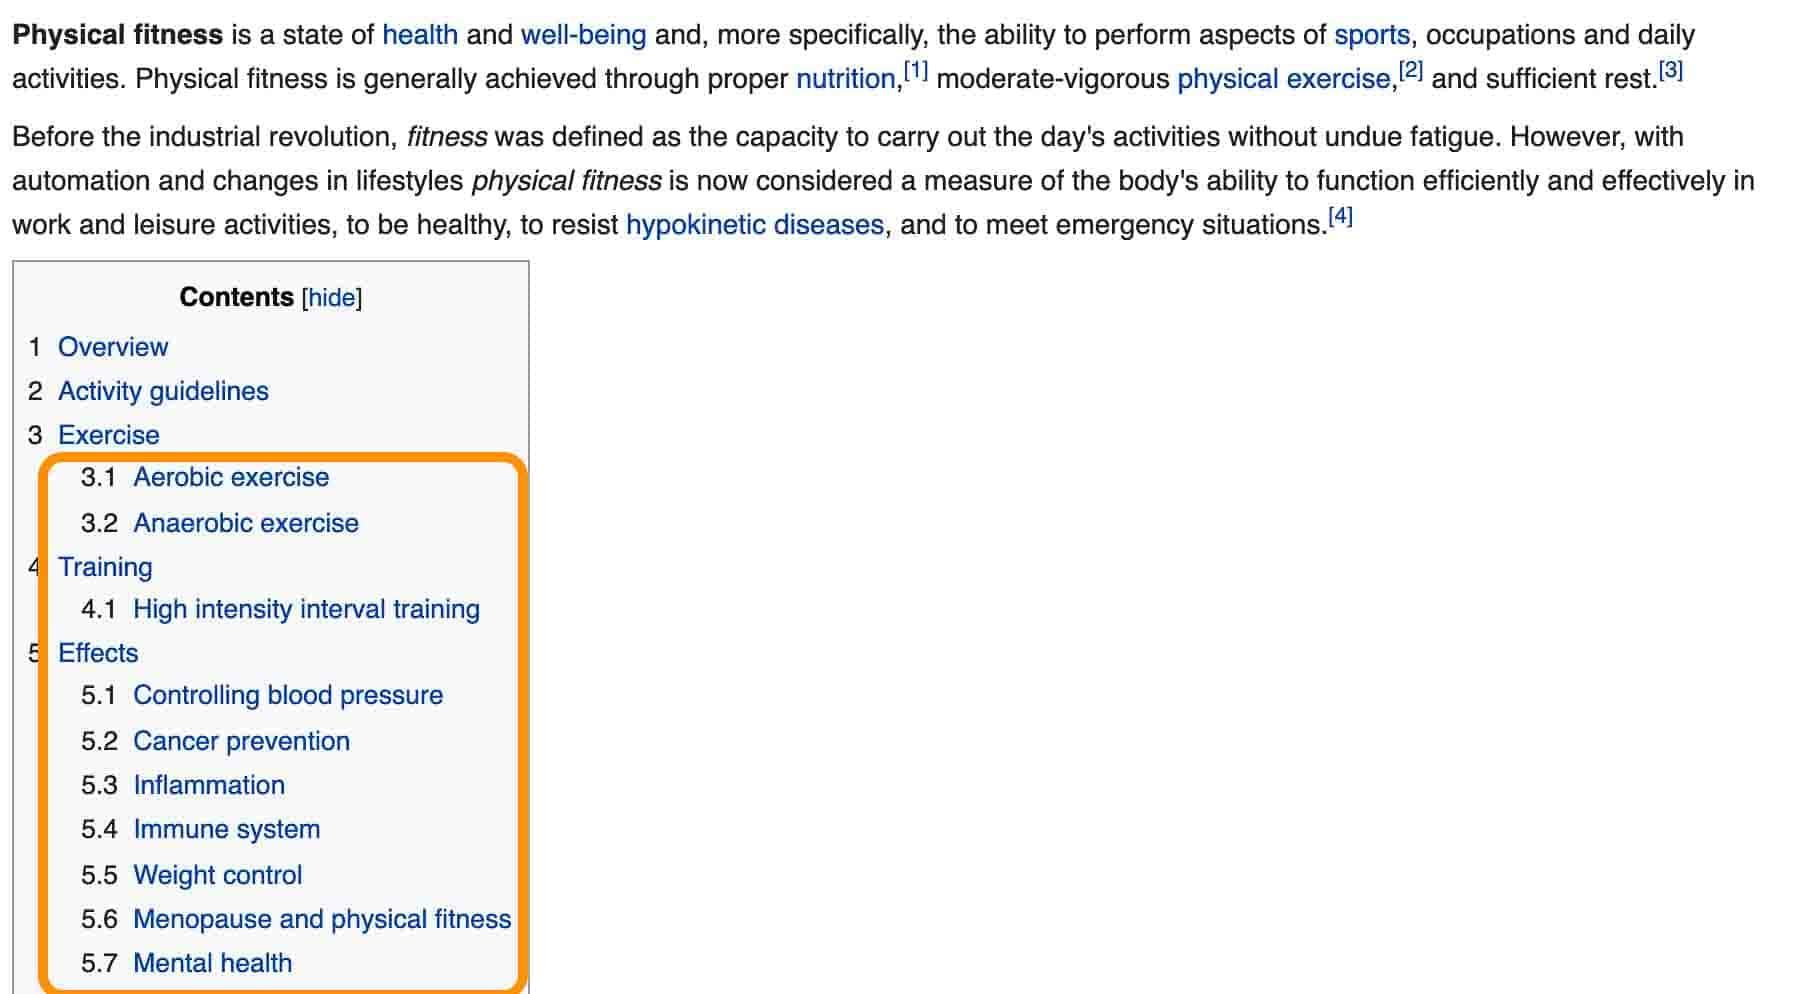 fitness keywords